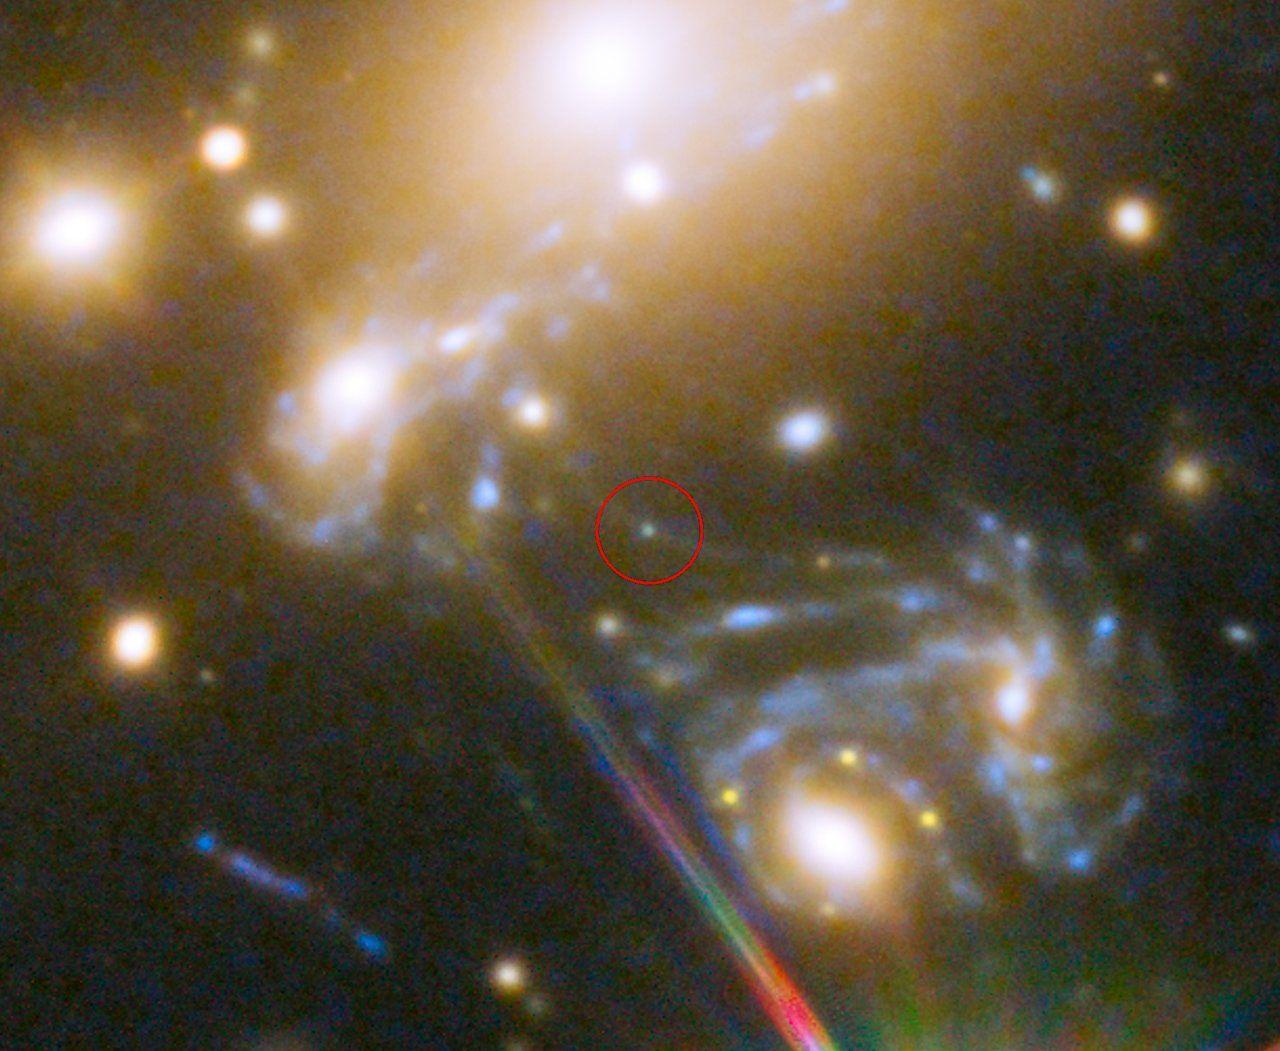 Lensed Star In The Cluster Macs J 5 223